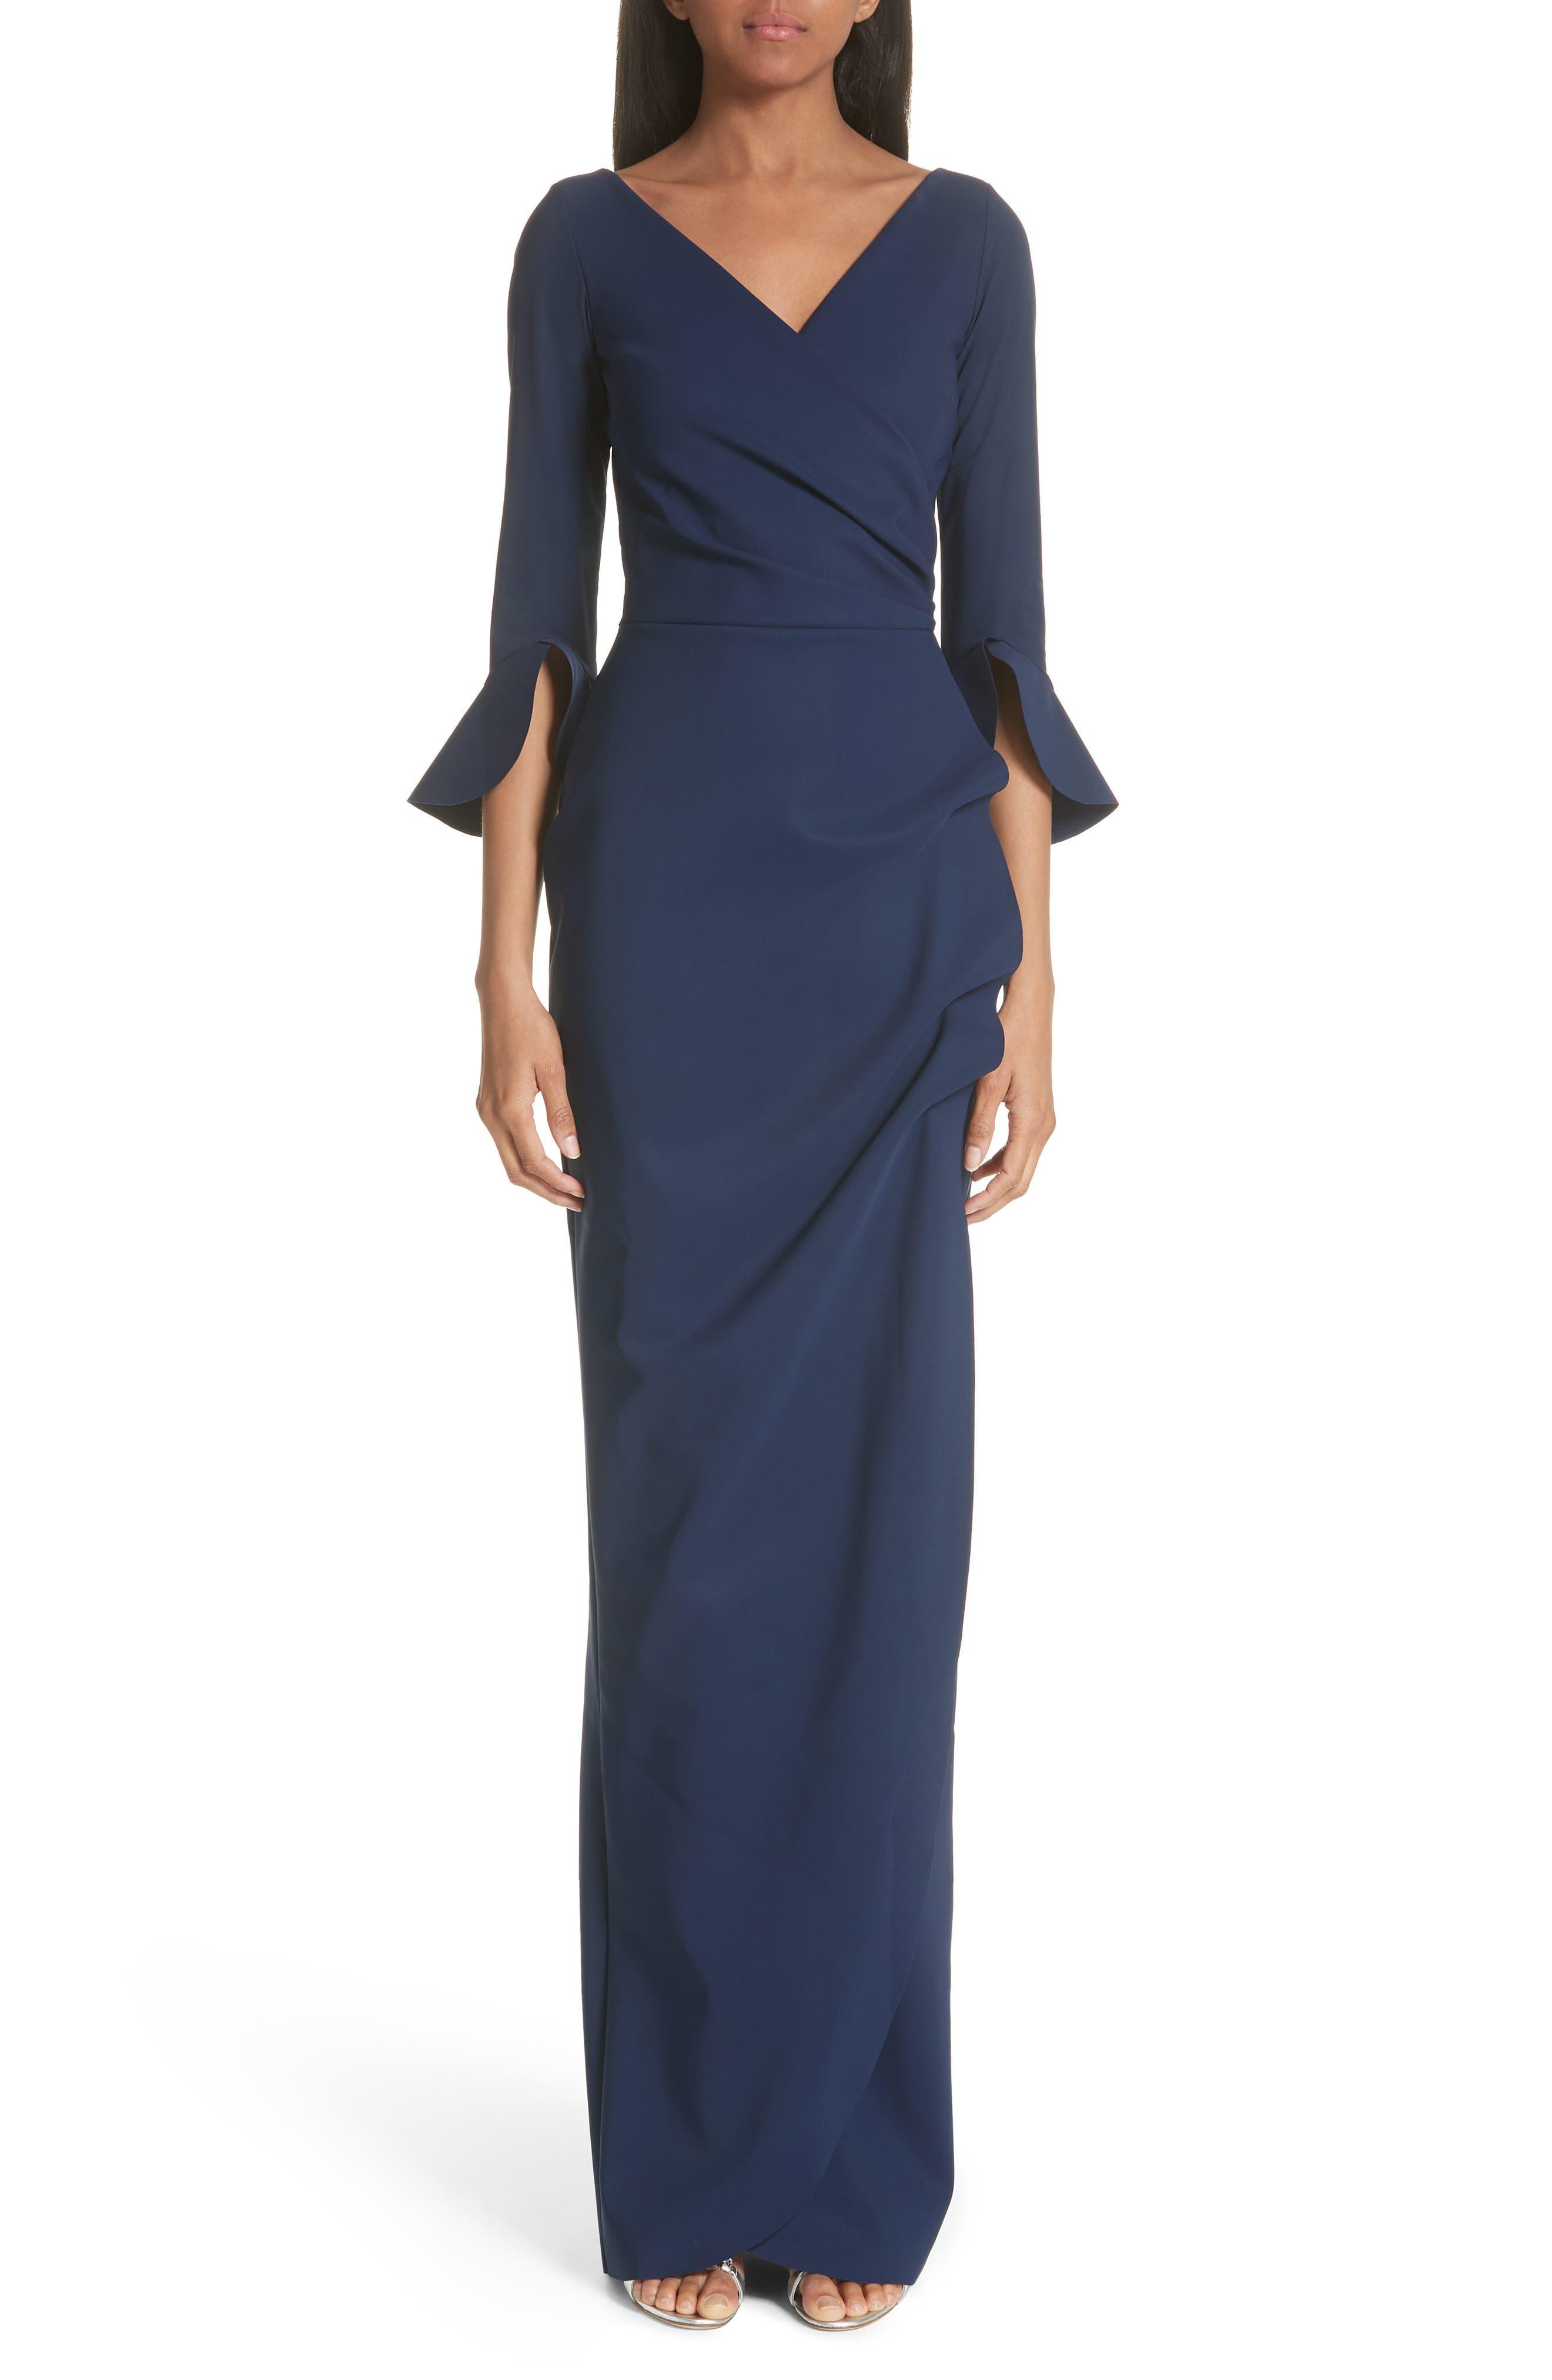 Chiara Boni La Petite Robe Ruched Bell Sleeve Evening Dress, 8 IT - Blue